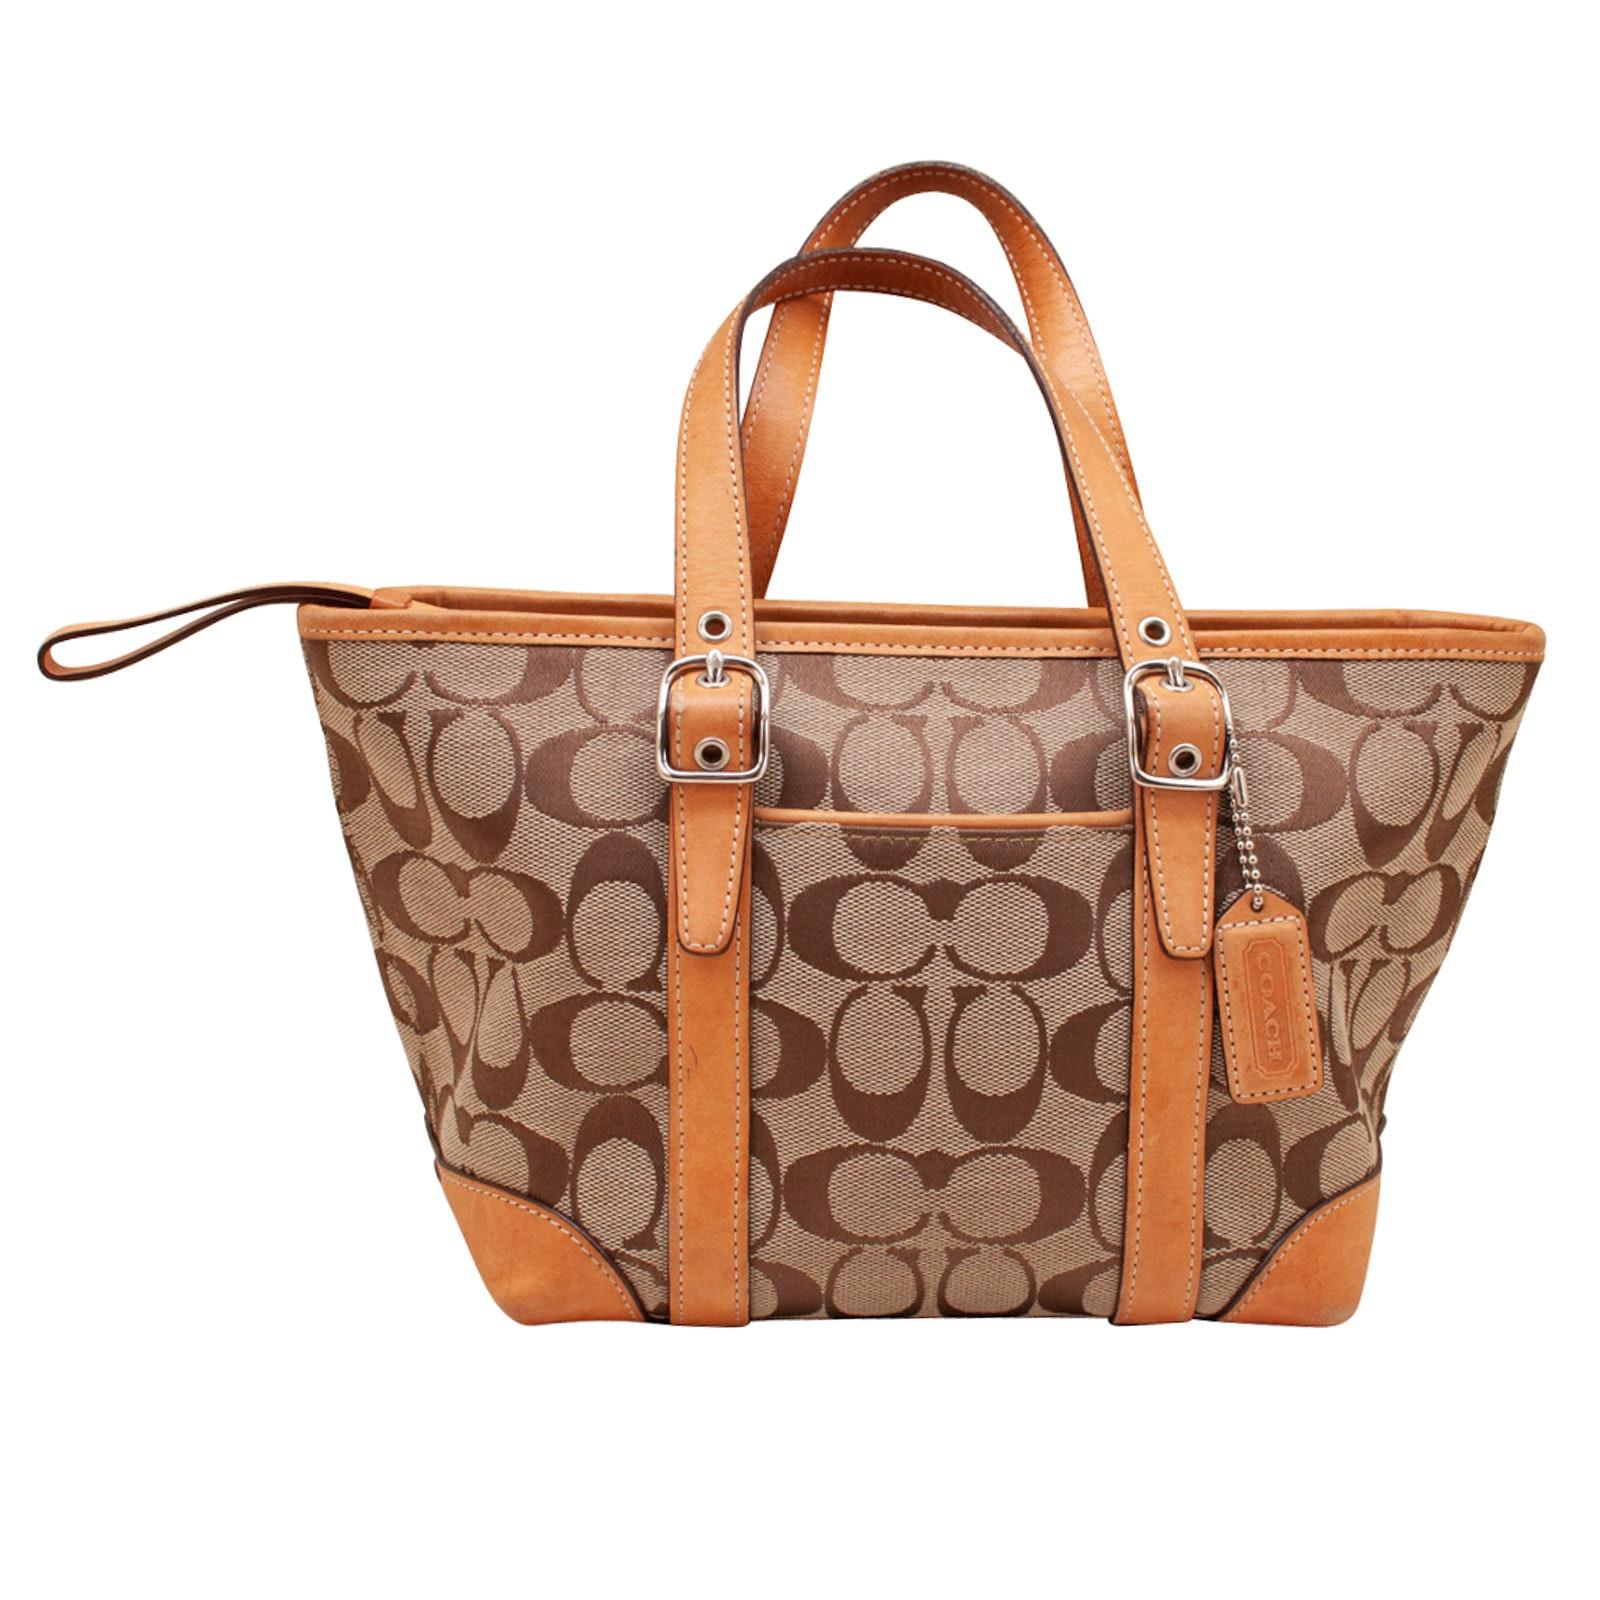 Coach Hamptons Signature Jacquard Handbag